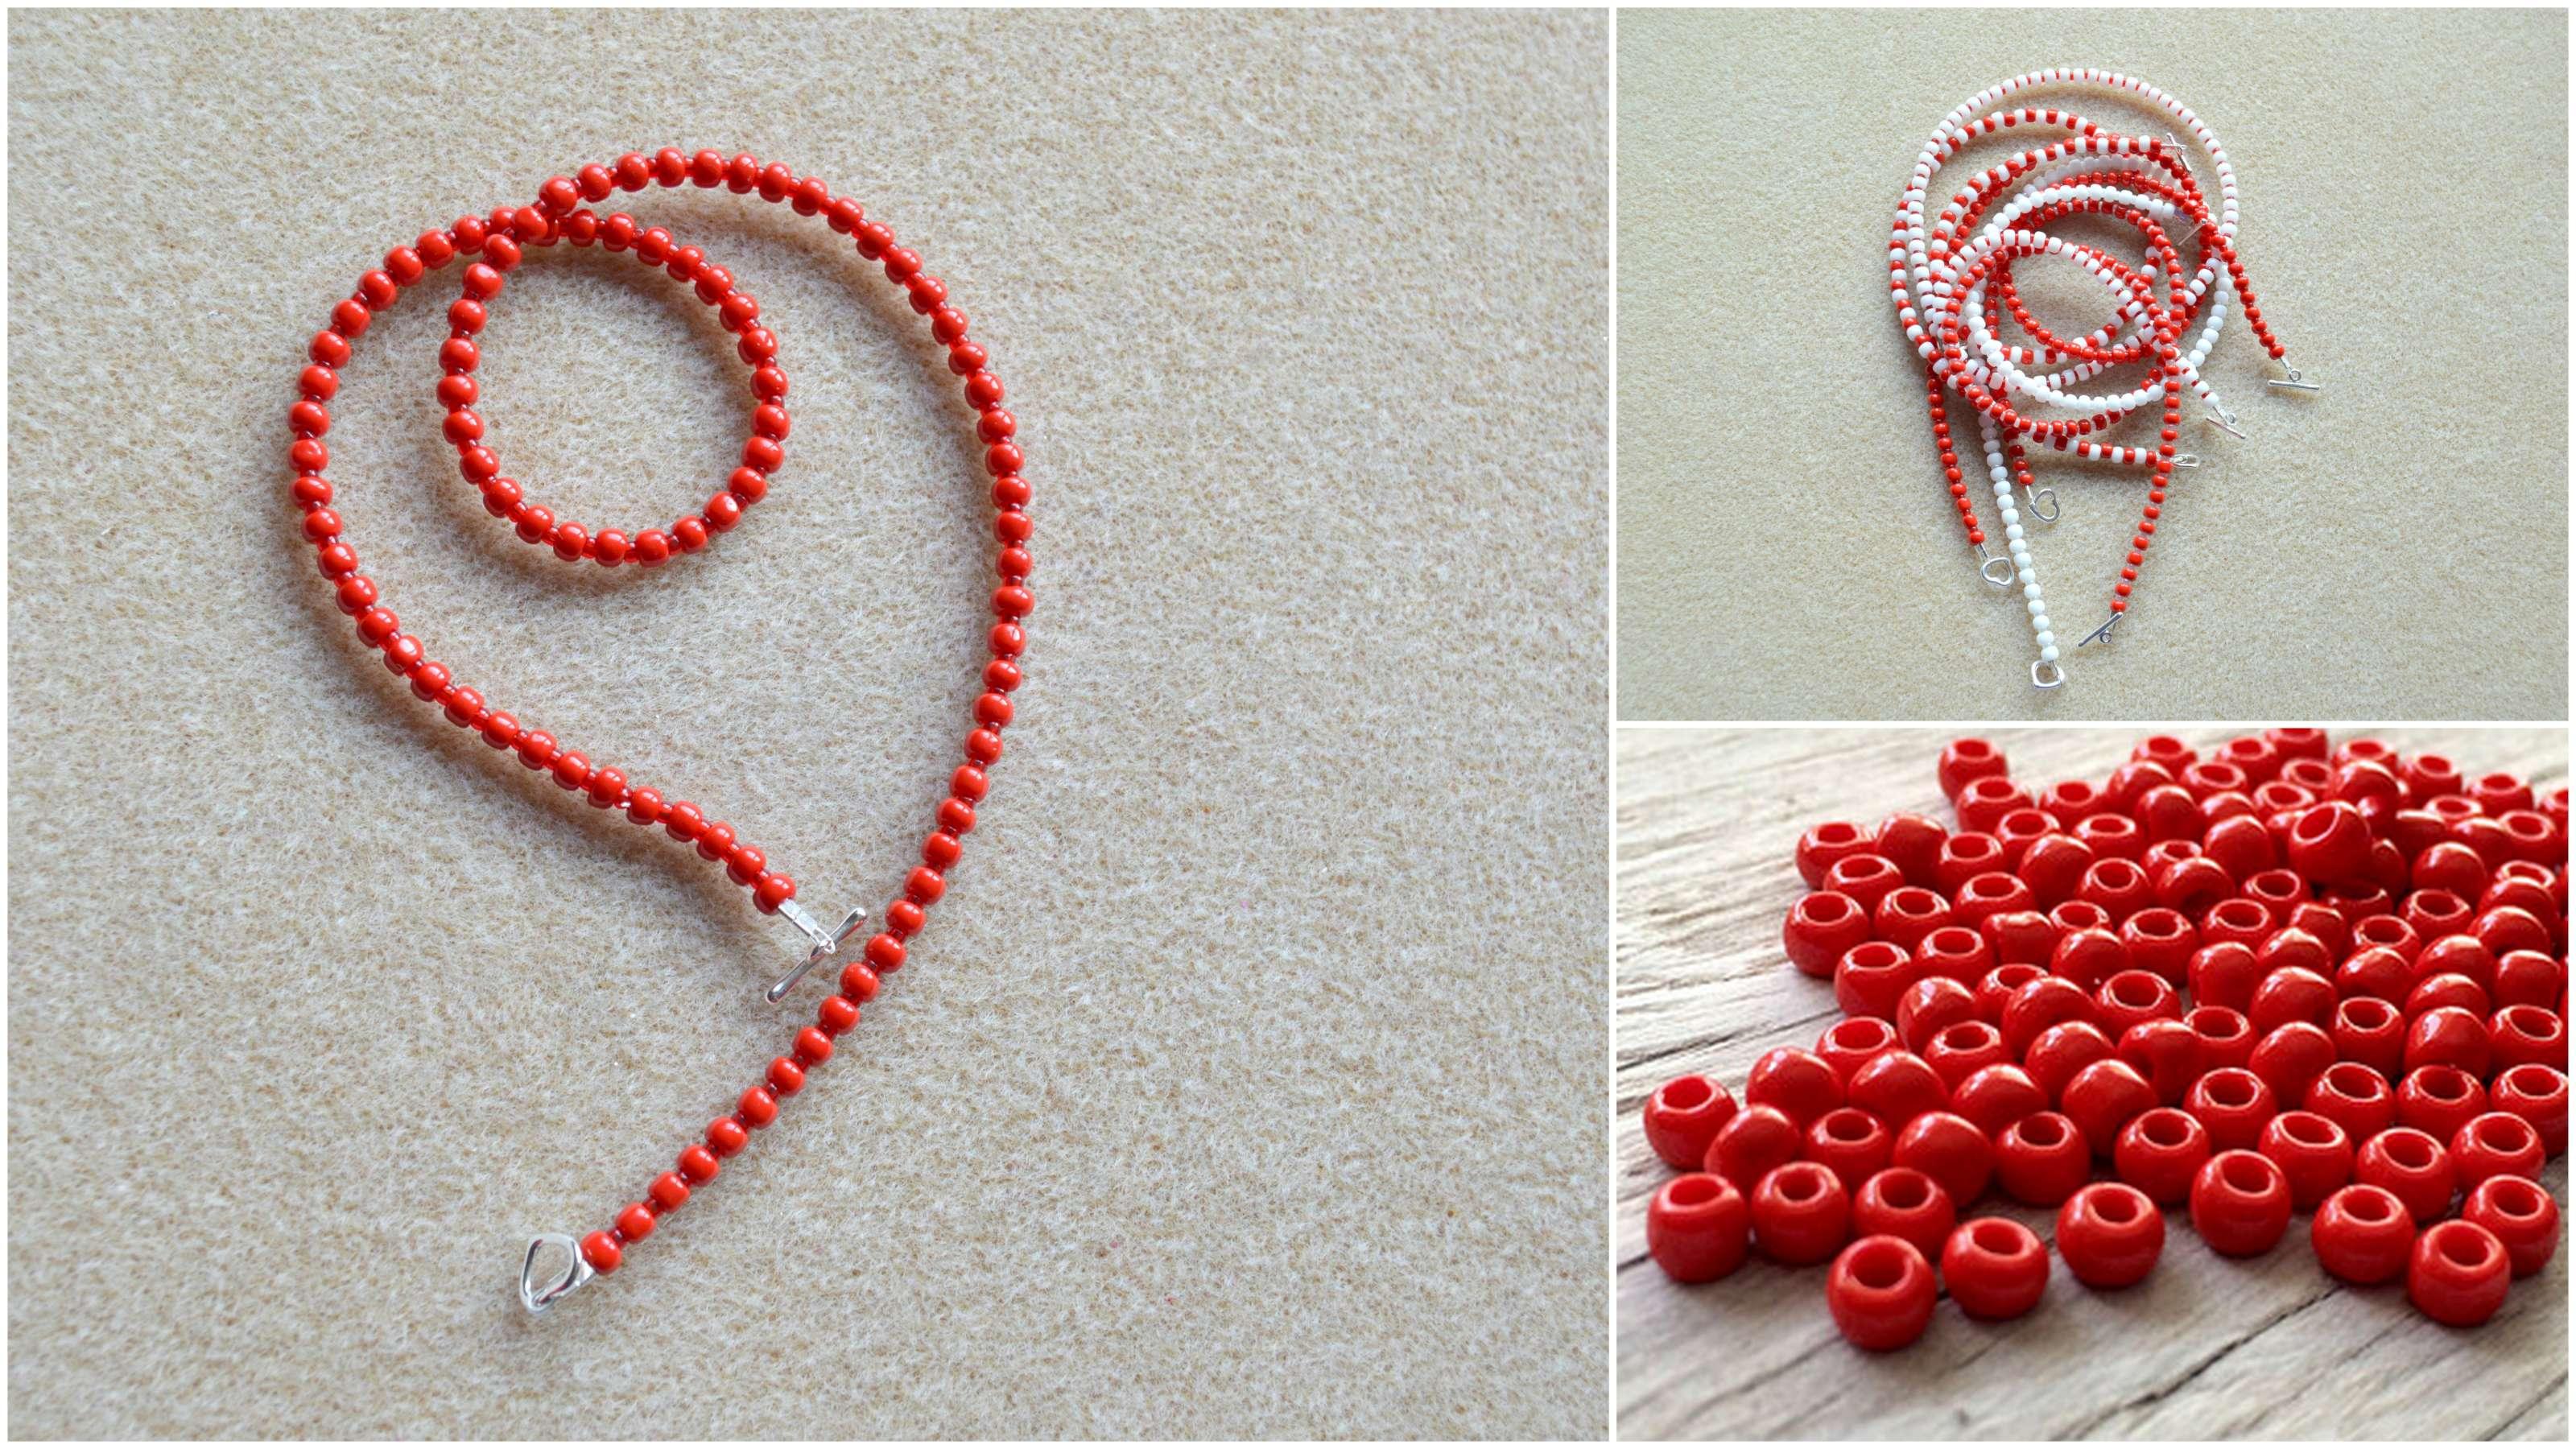 beads bbfc toho choose seed ebay itm to colors size japanese